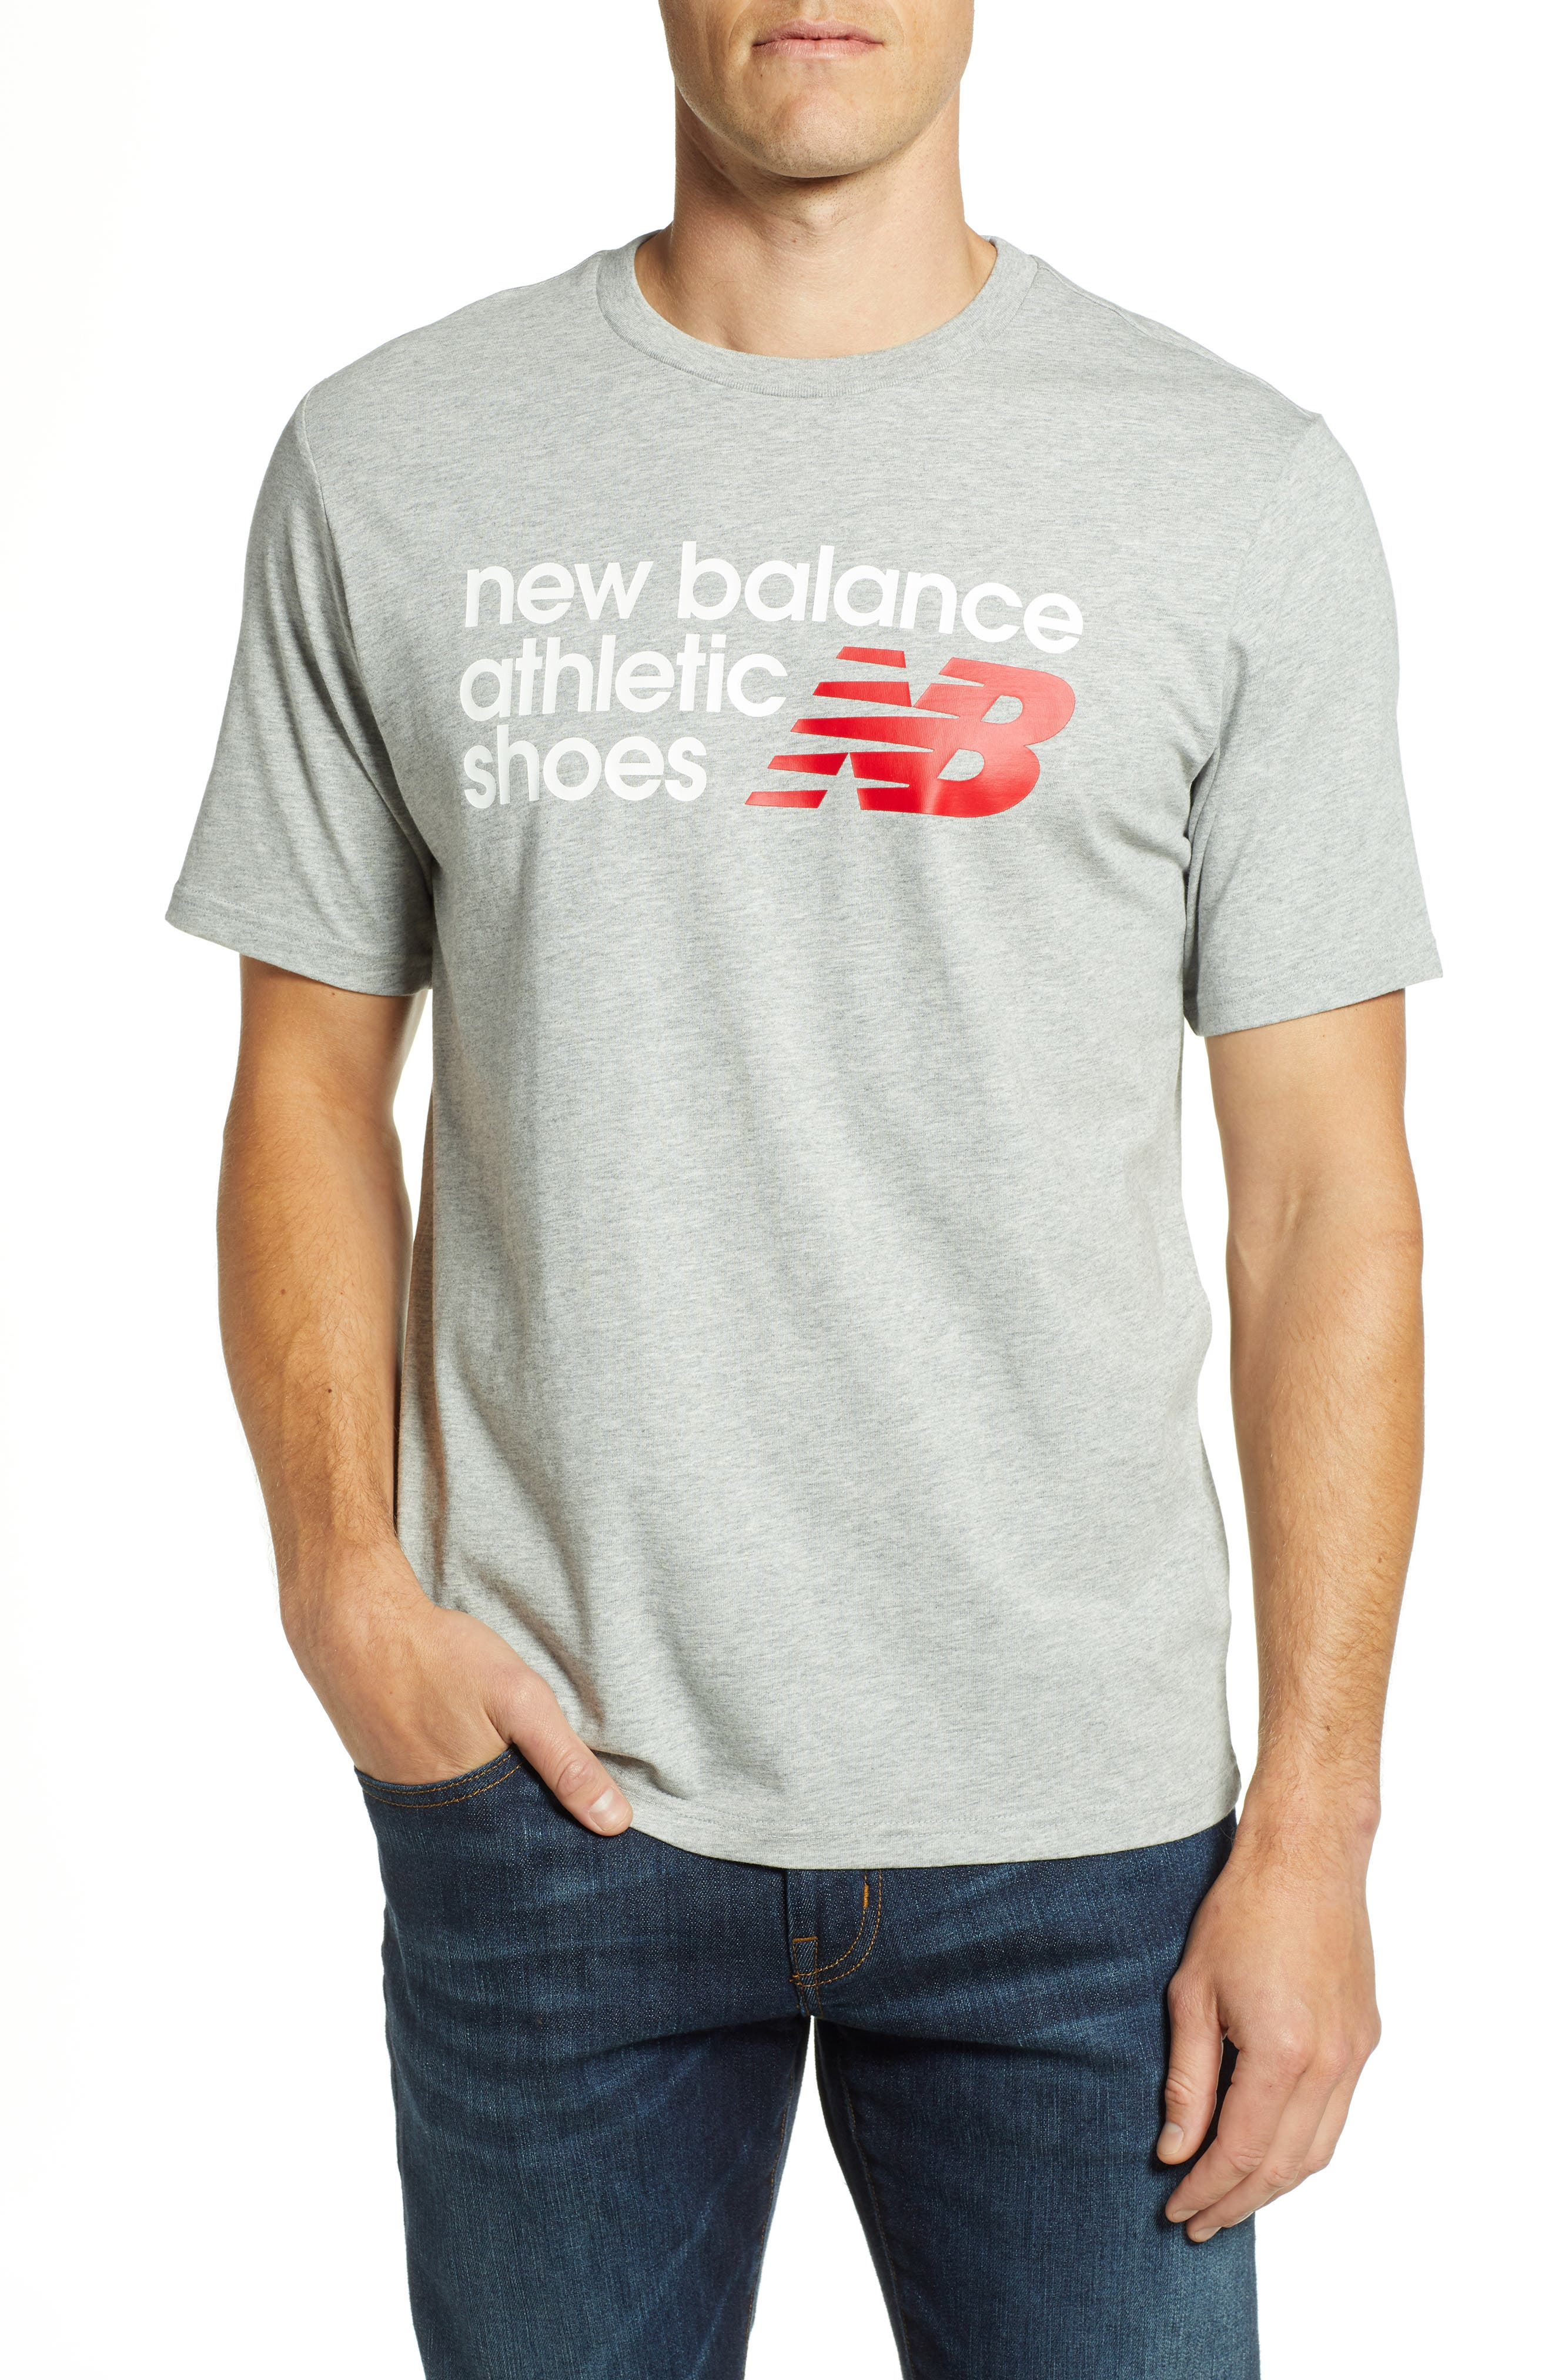 New Balance Nb Shoe Box Graphic T-Shirt, Grey